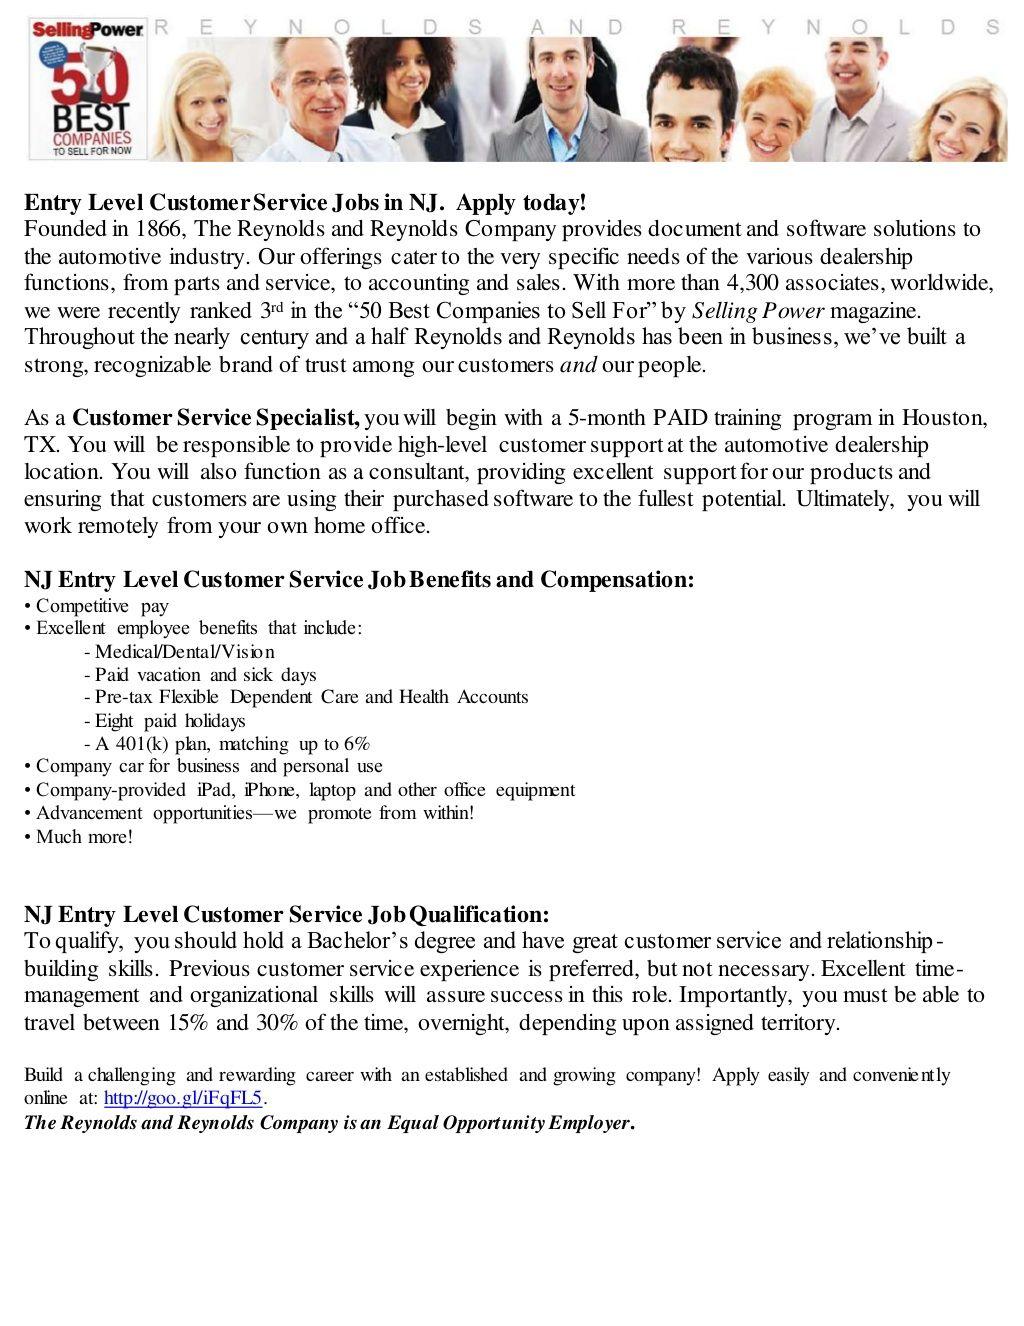 Entry level customer service jobs in nj marketing jobs